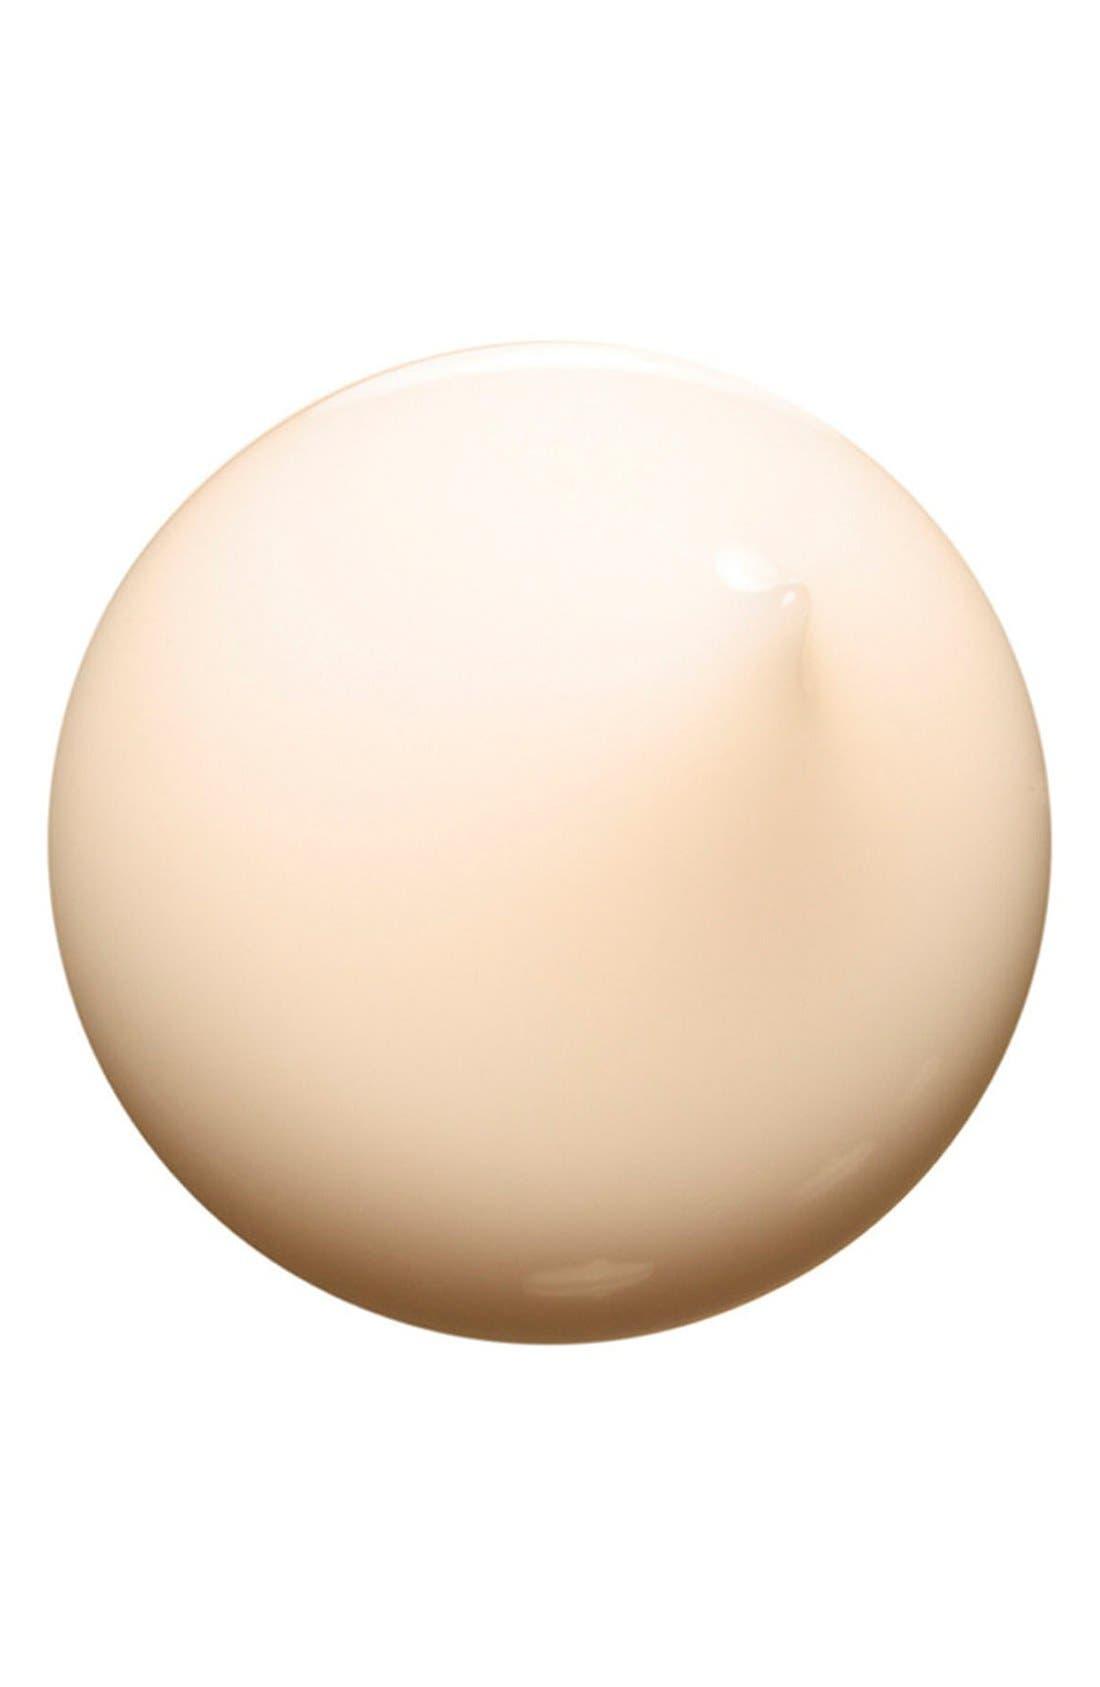 Super Restorative Redefining Body Care Cream for Abdomen and Waist,                             Alternate thumbnail 3, color,                             NO COLOR